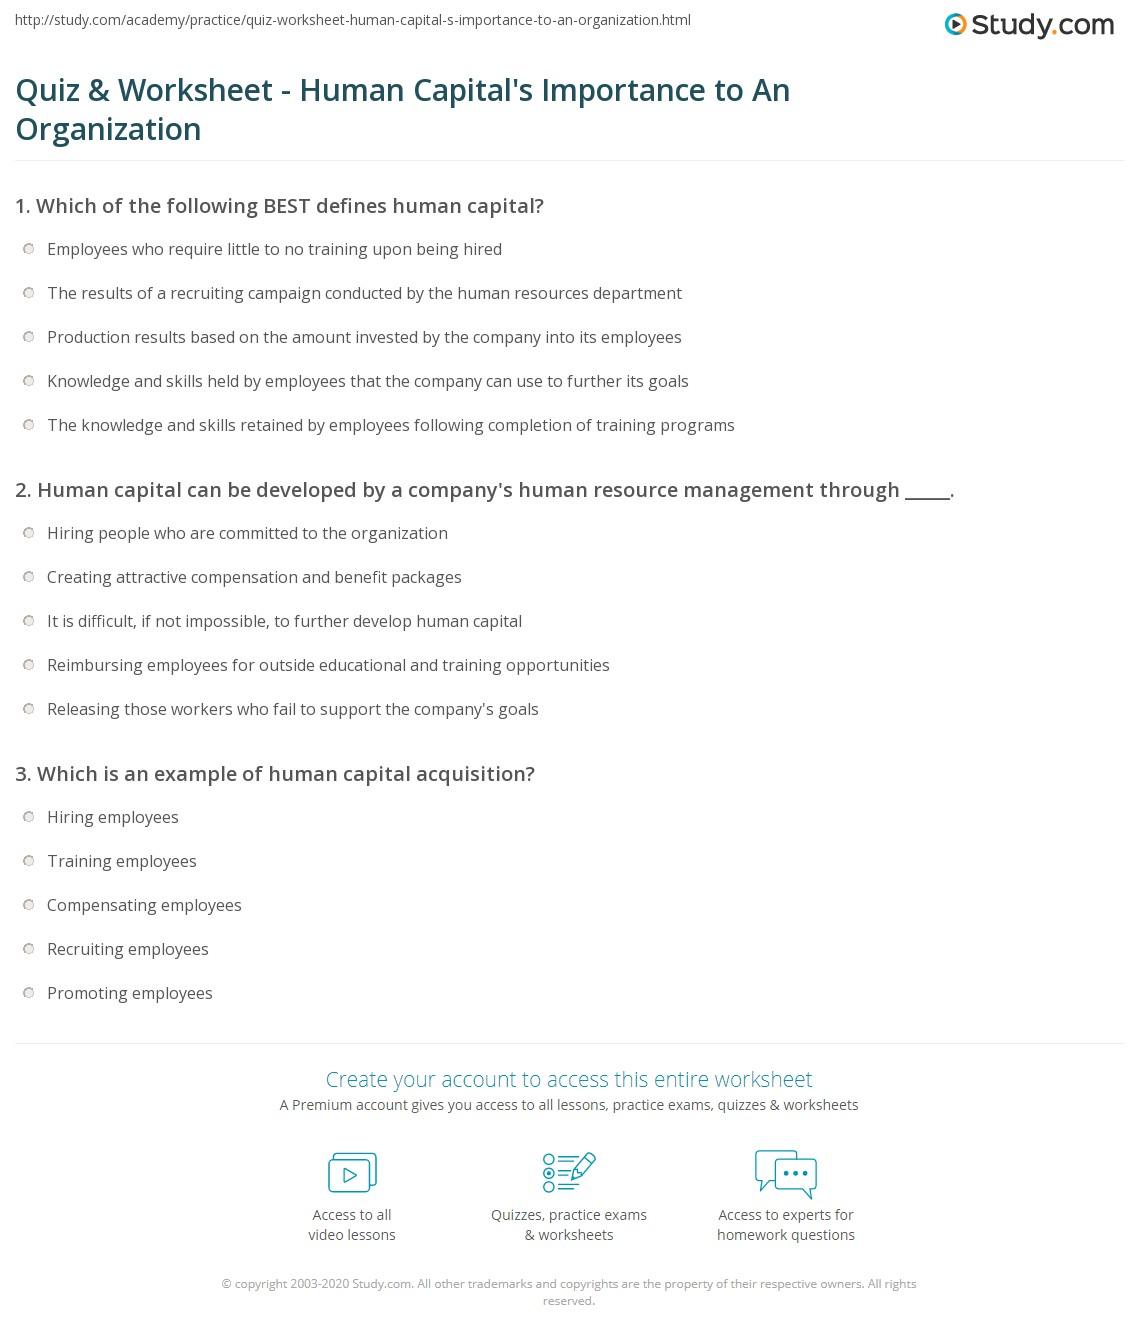 Quiz Worksheet Human Capital S Importance To An Organization